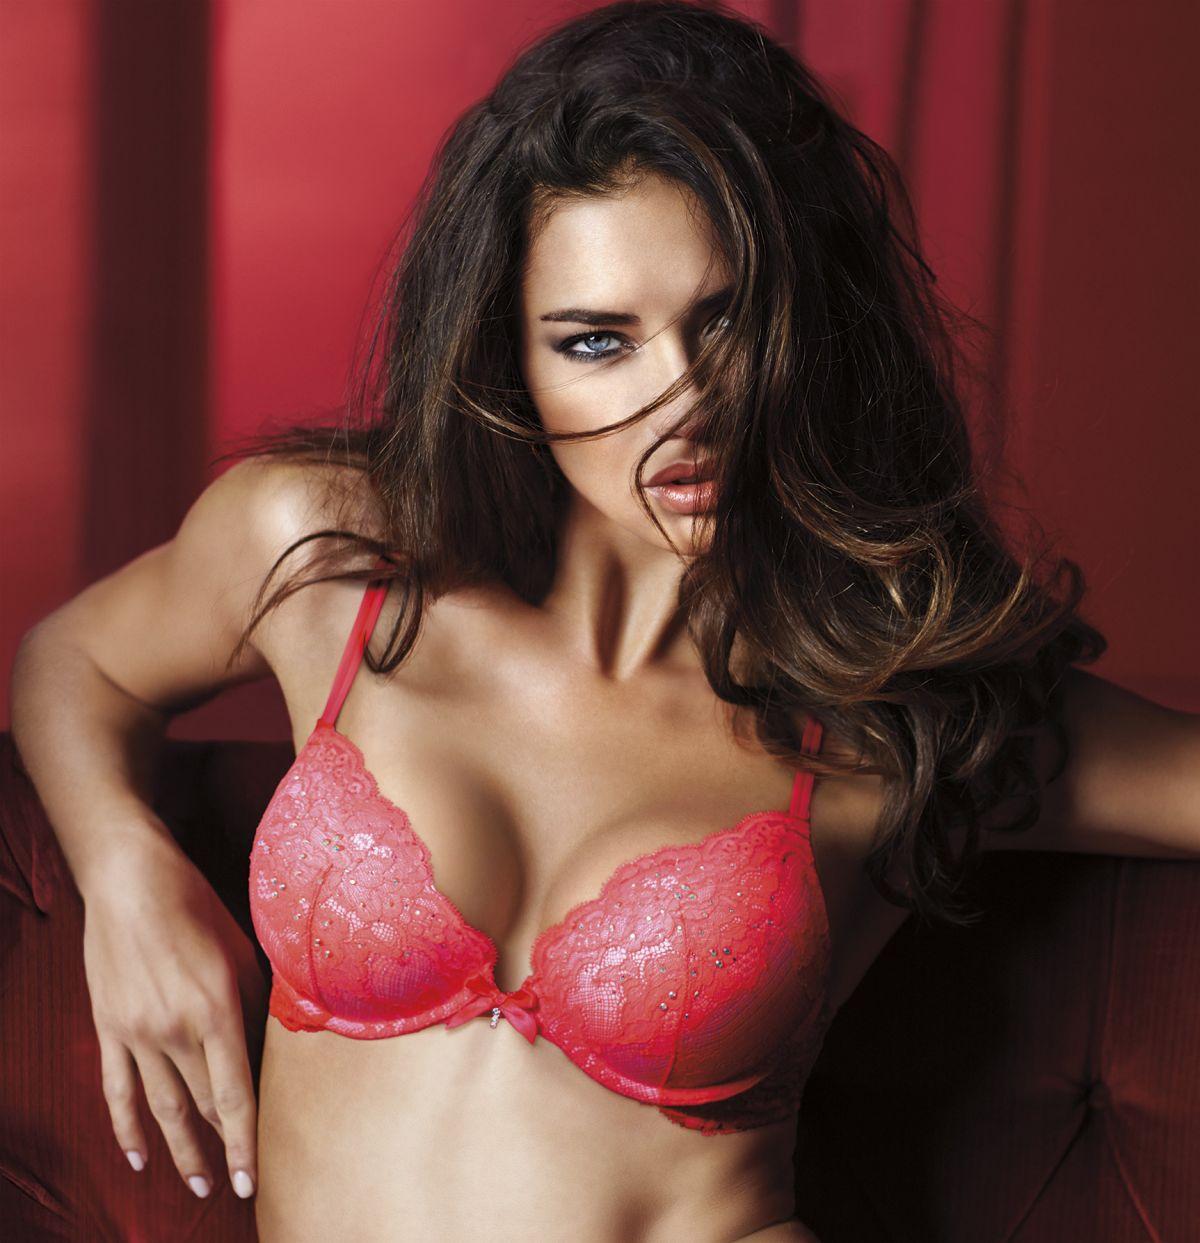 Victorias secret sexy brazilian bombshell silky logo cheeky panty panties nwt